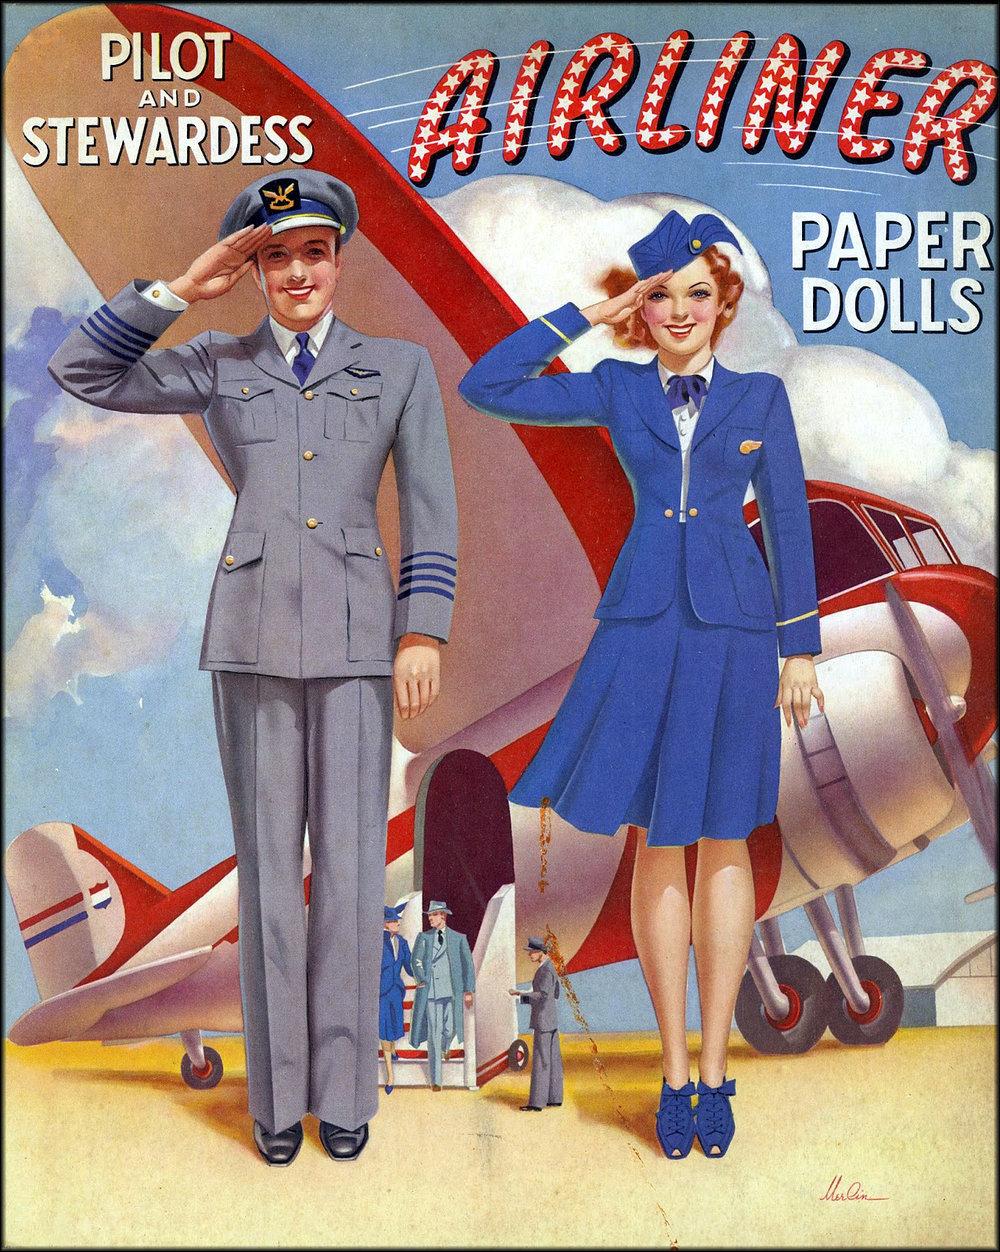 Vintage Travel and Vintage Airlines Cookbooks